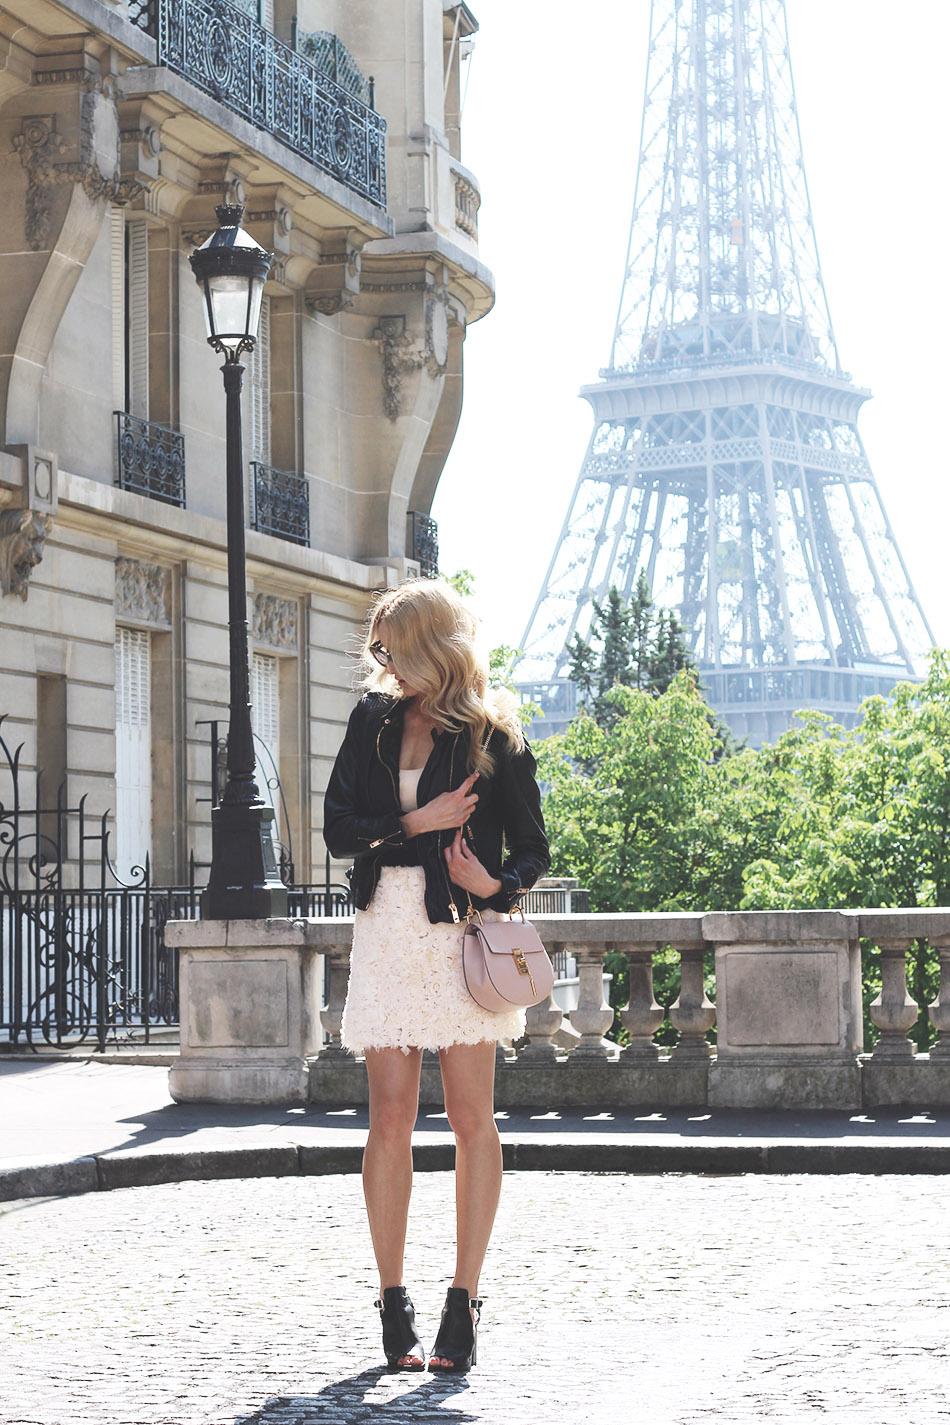 La Tour Eiffel - Pic 2